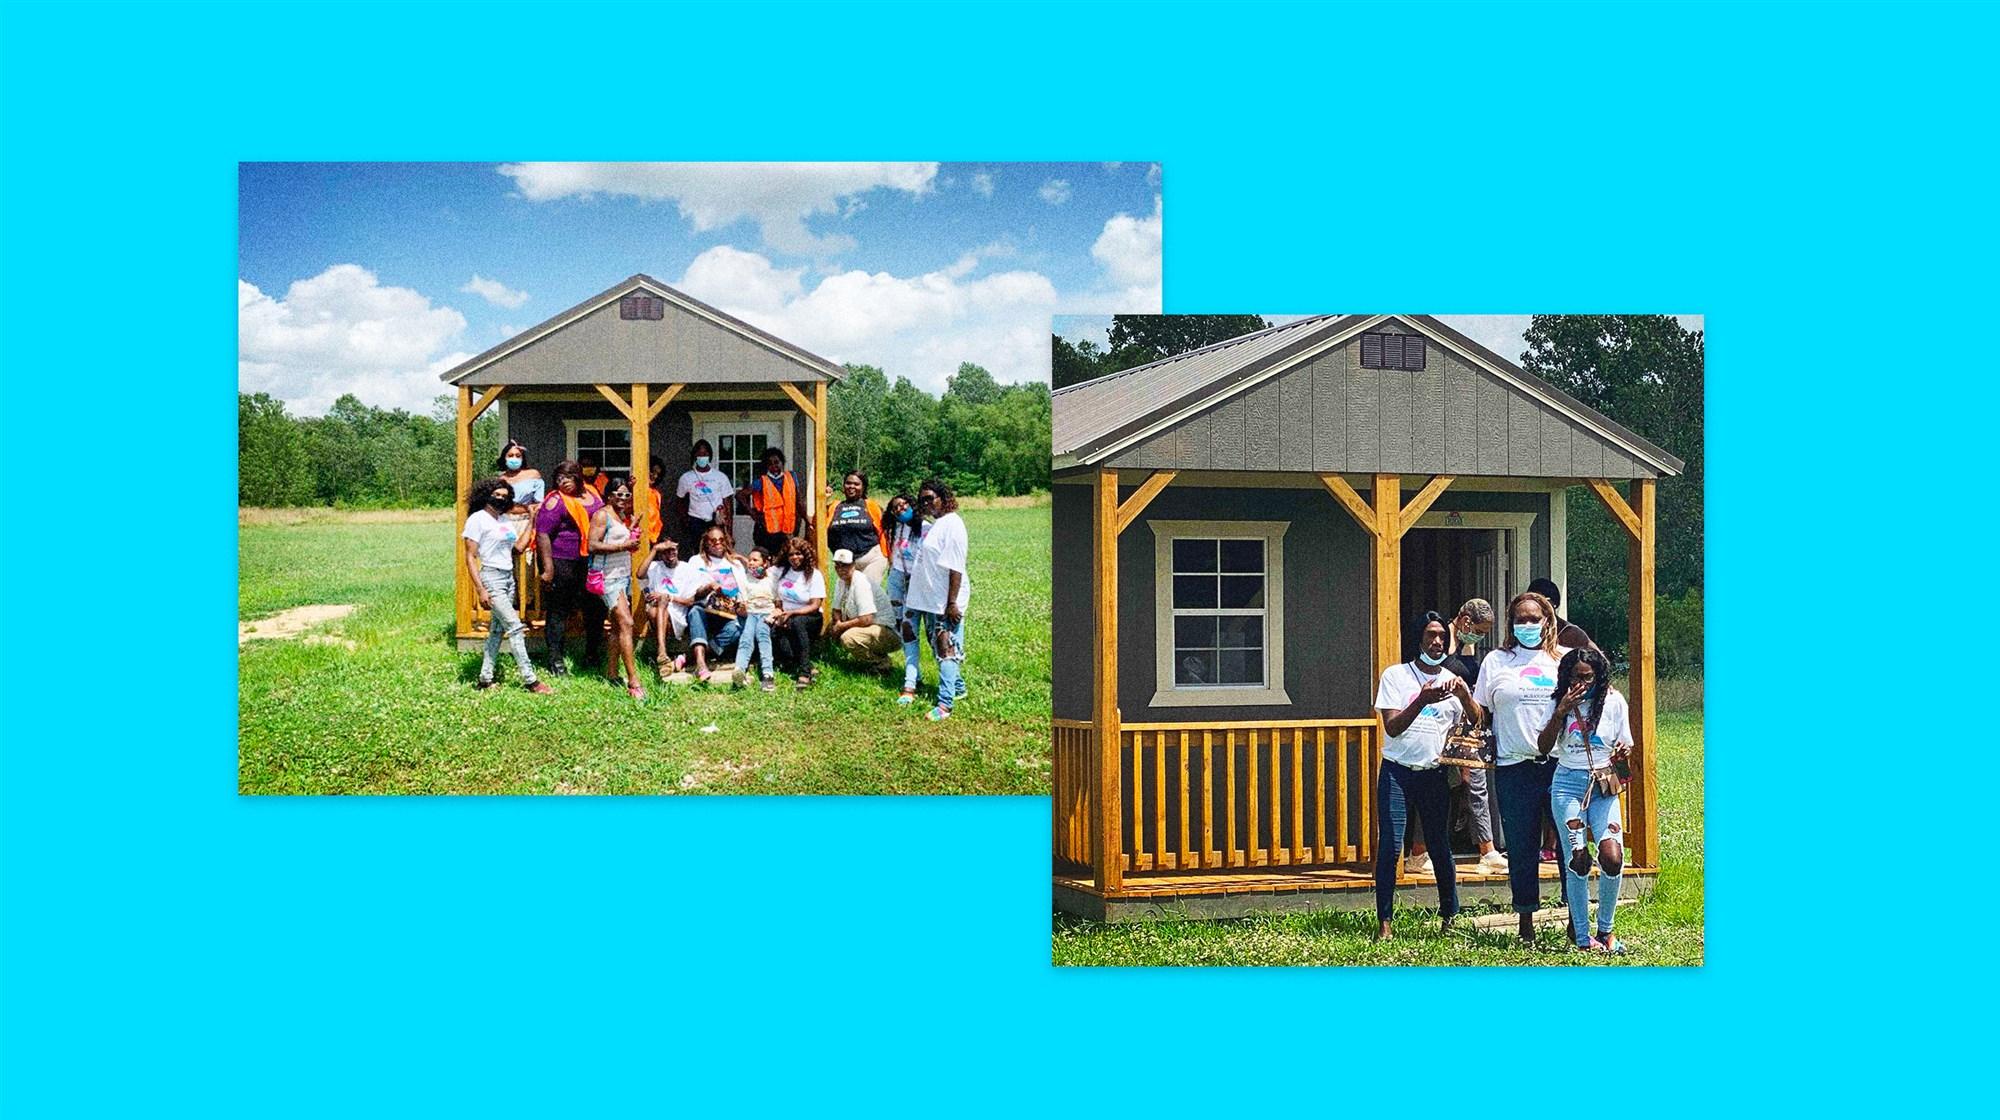 Nonprofit Hopes To Build 20 Tiny Homes For Black